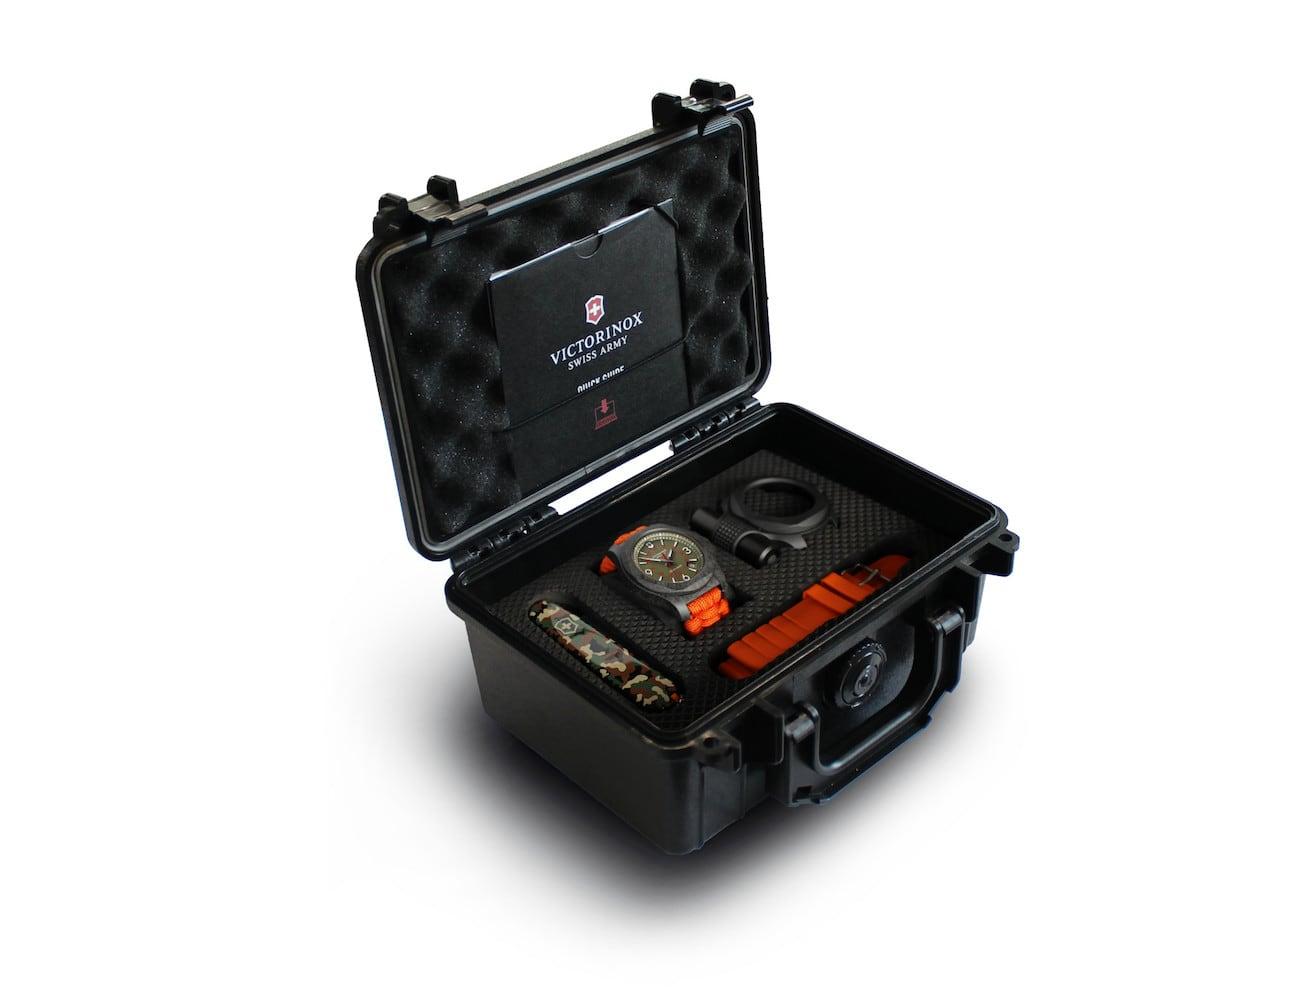 Victorinox I.N.O.X. Carbon Limited Edition Watch